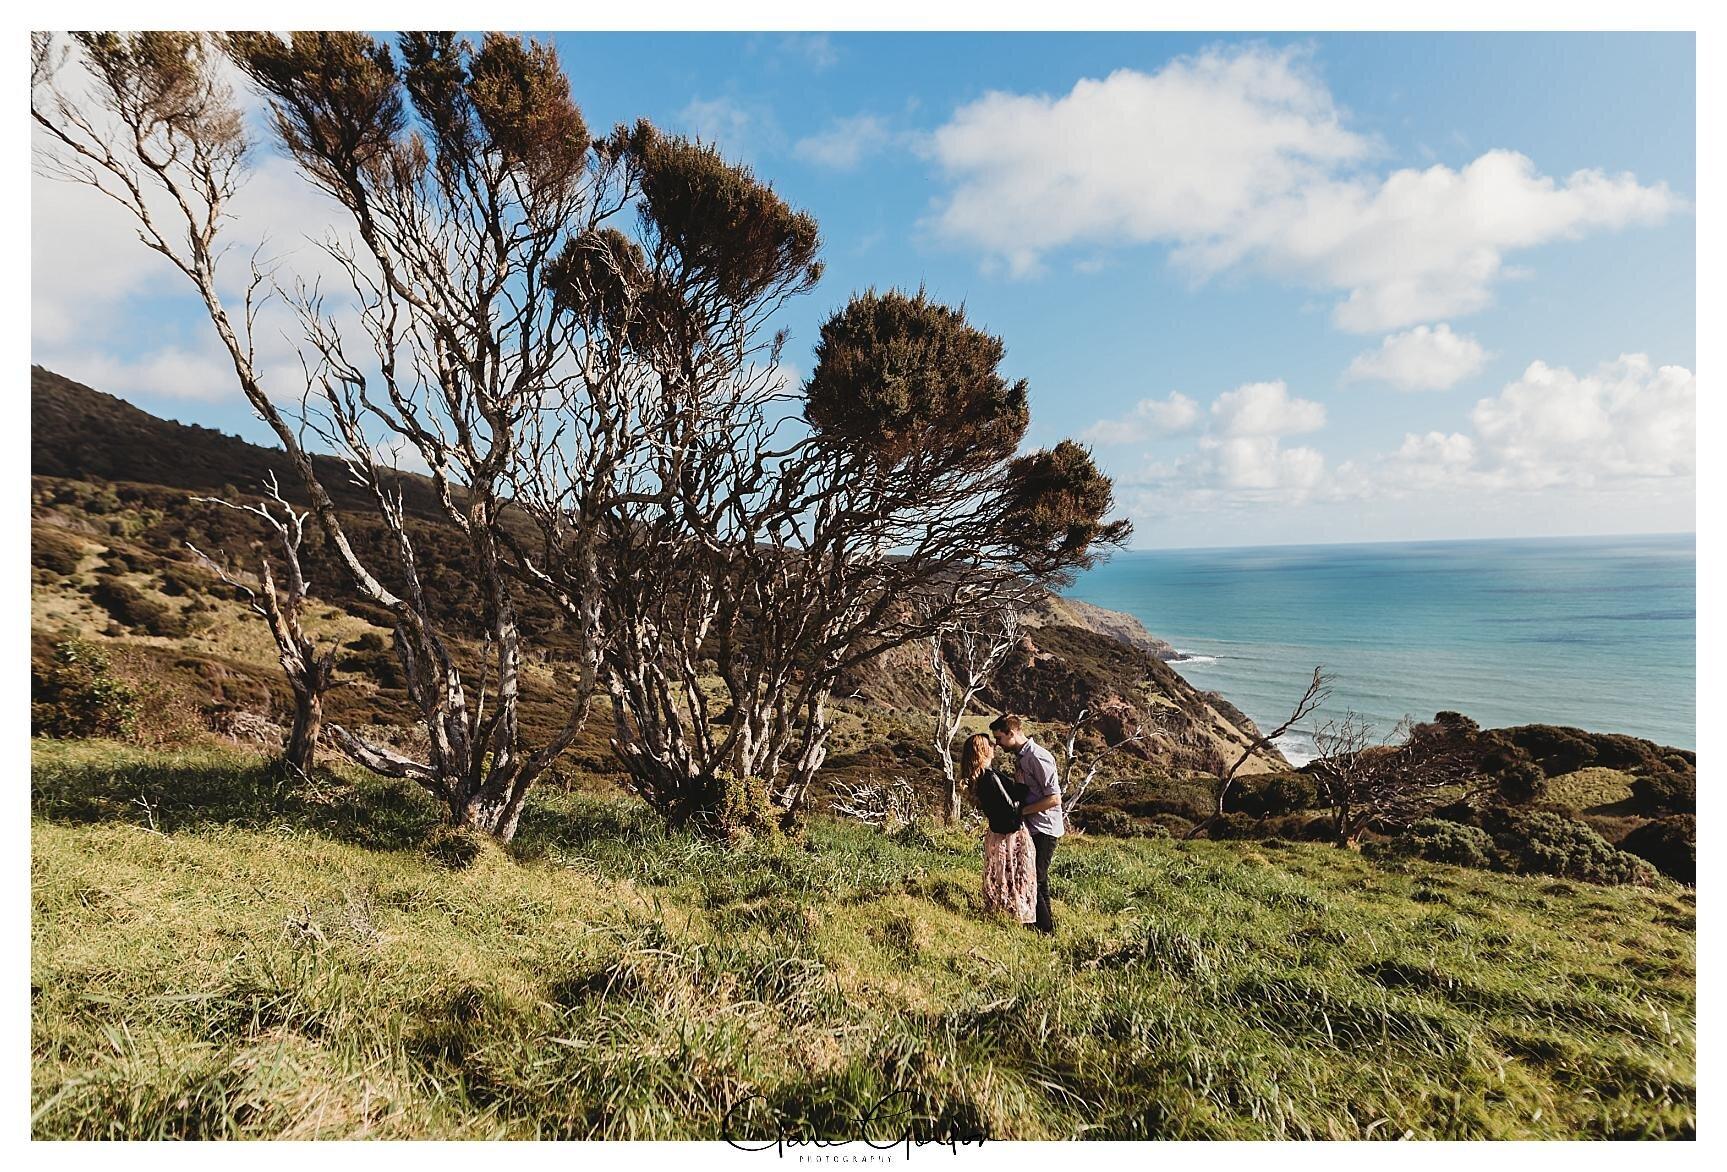 Raglan-beach-NZ-couples-engagement-photos-West-coast-Newzealand (4).jpg